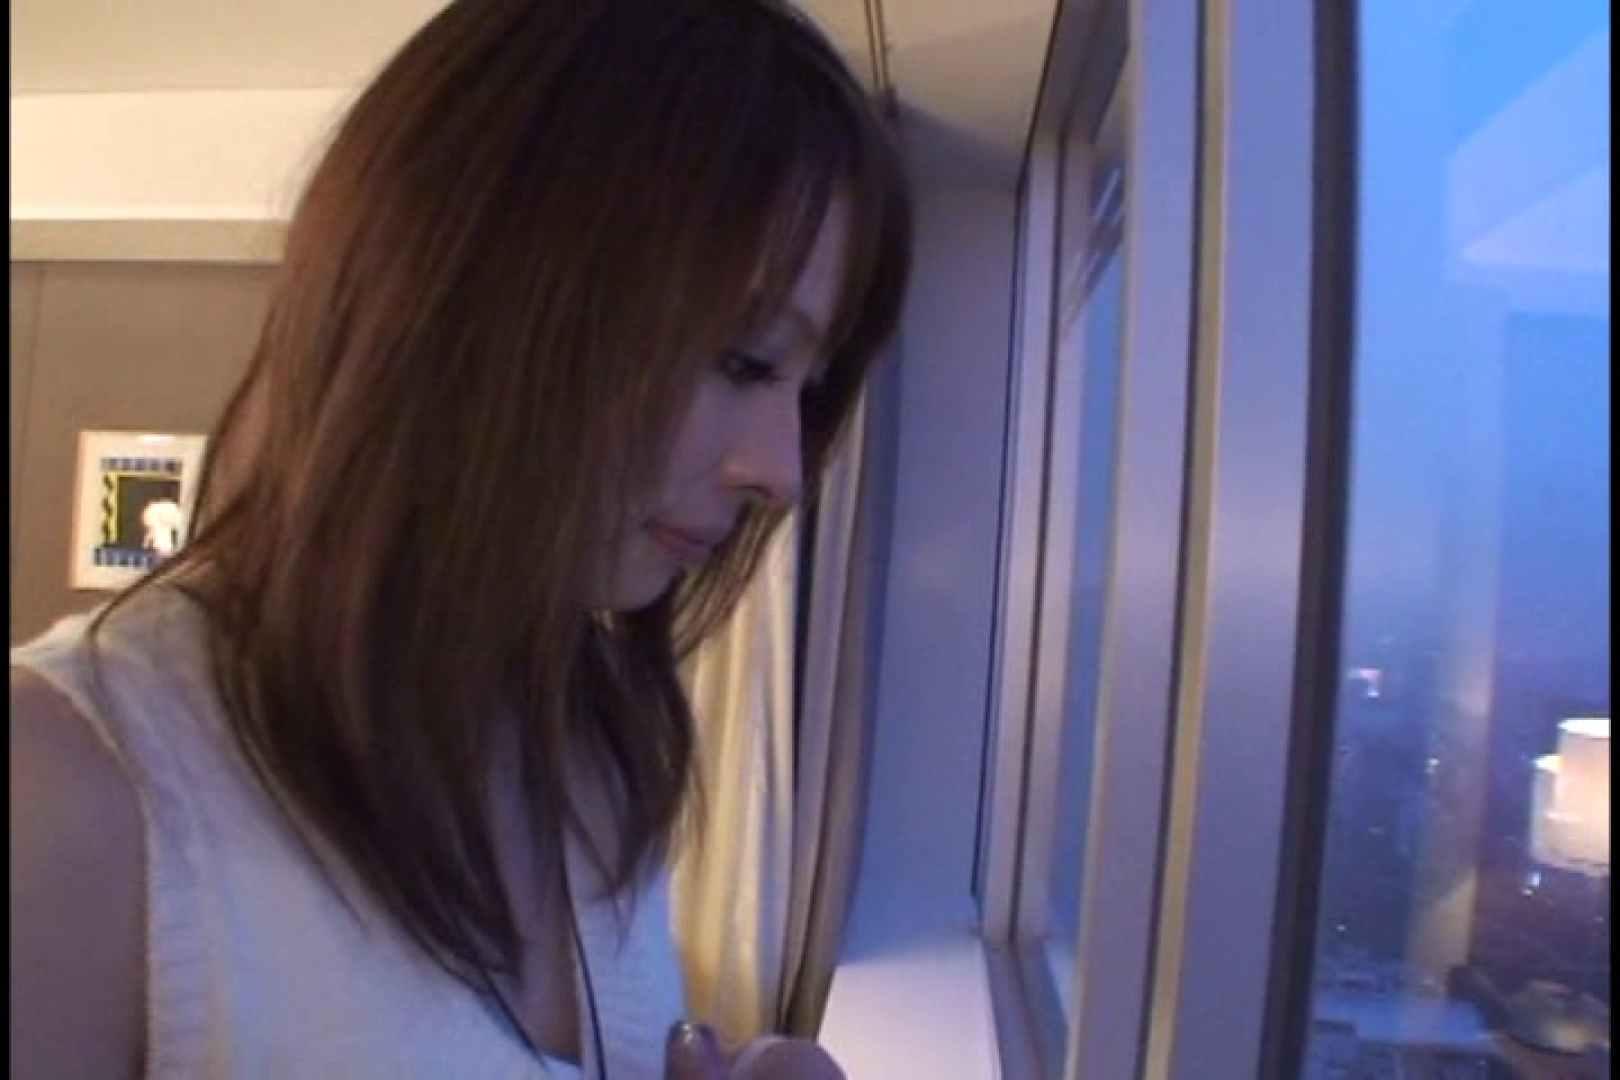 JDハンター全国ツアー vol.031 前編 女子大生のエロ動画 | 0  97PIX 53